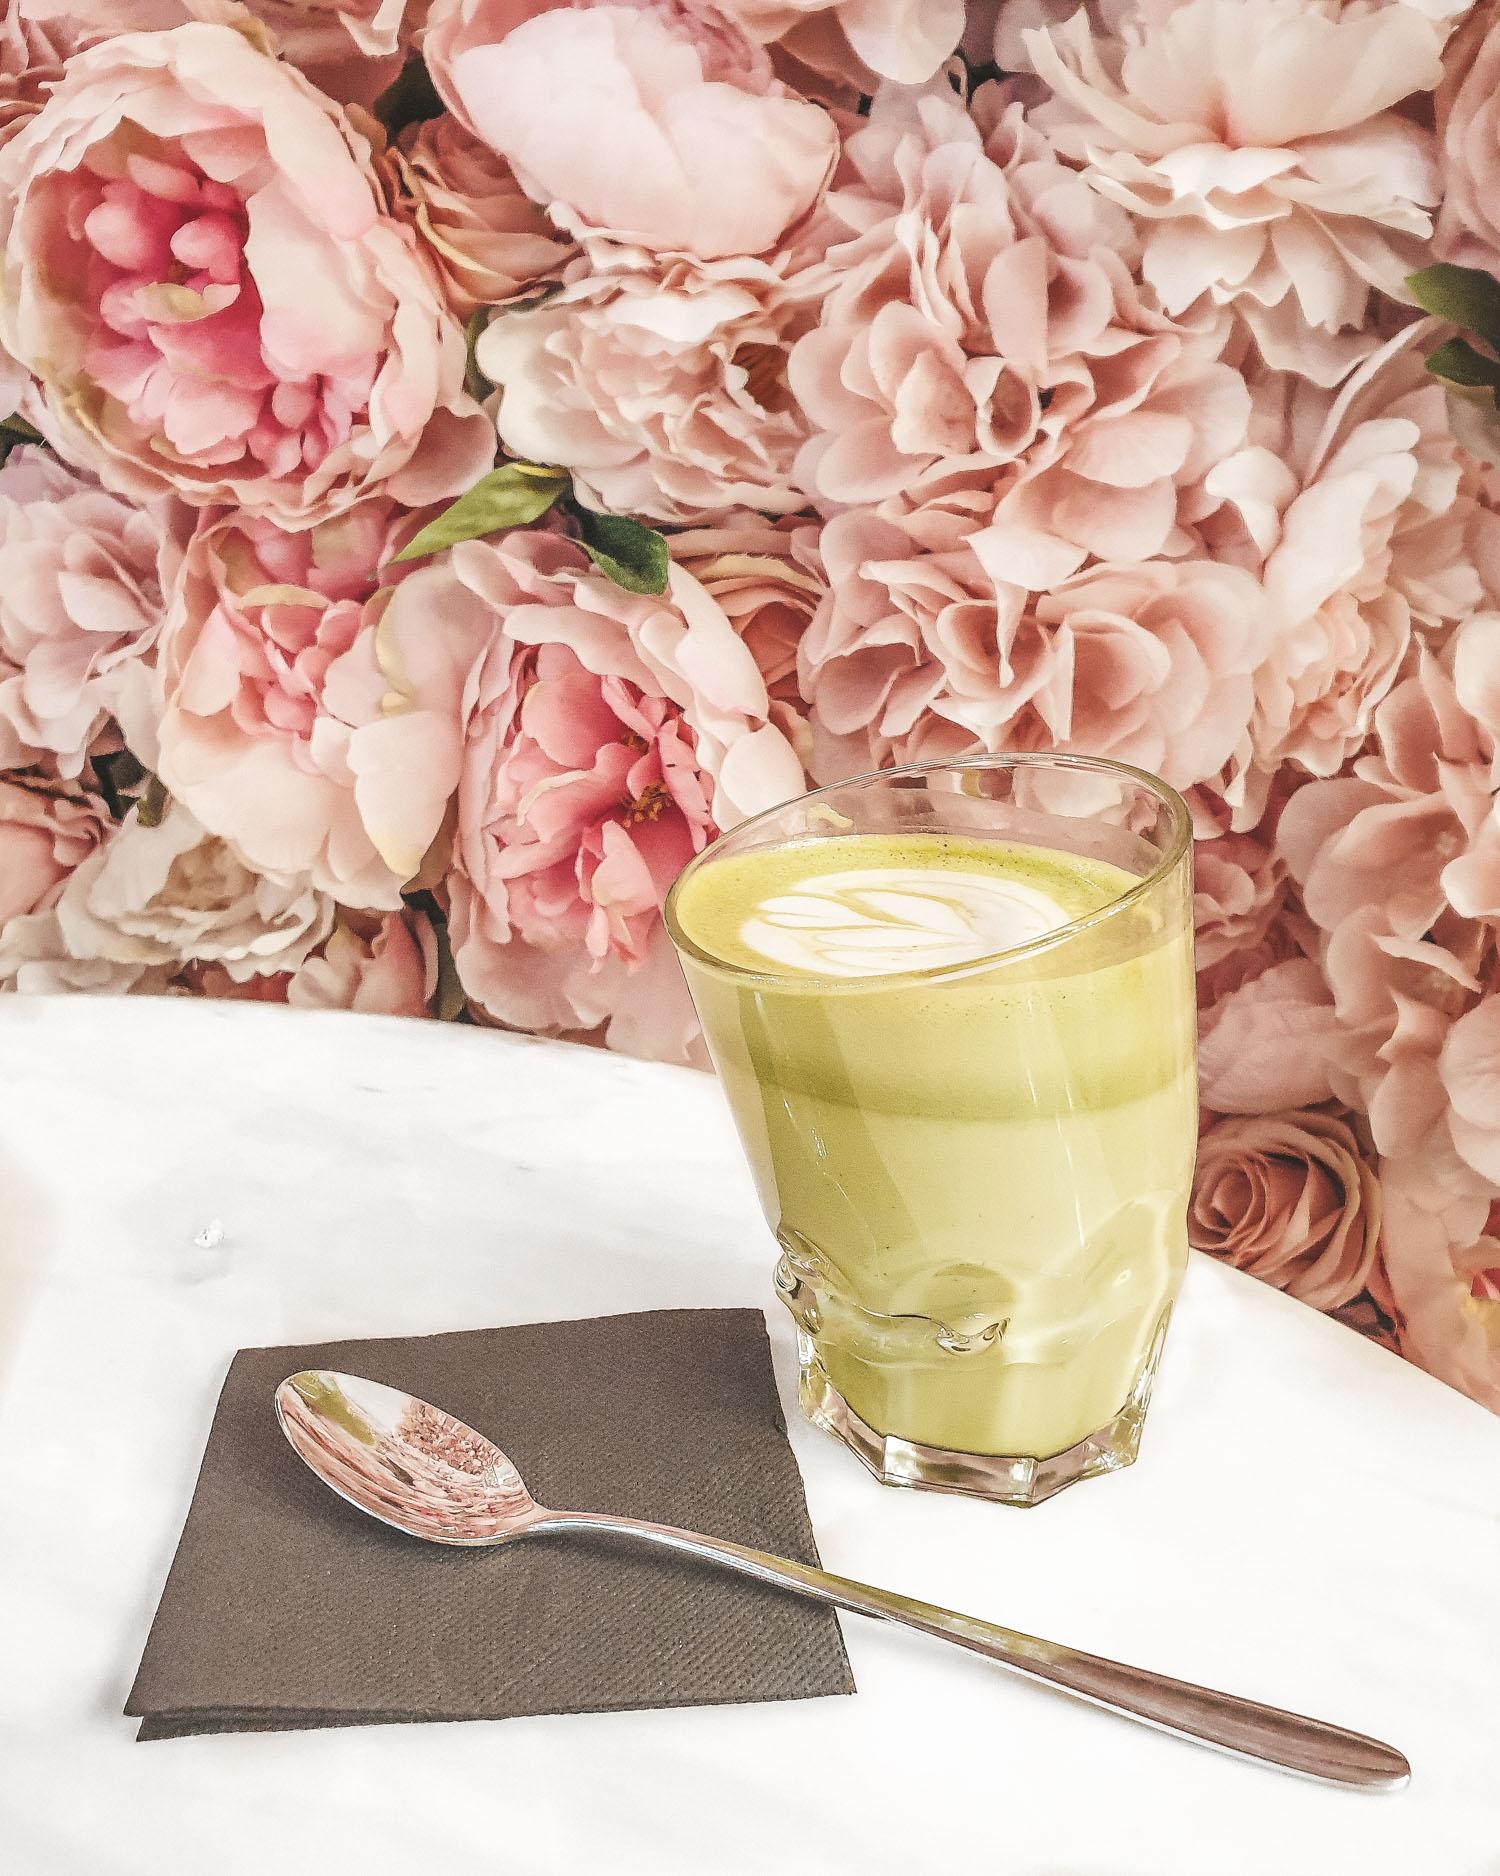 matcha latte at Secret Garden by Leto